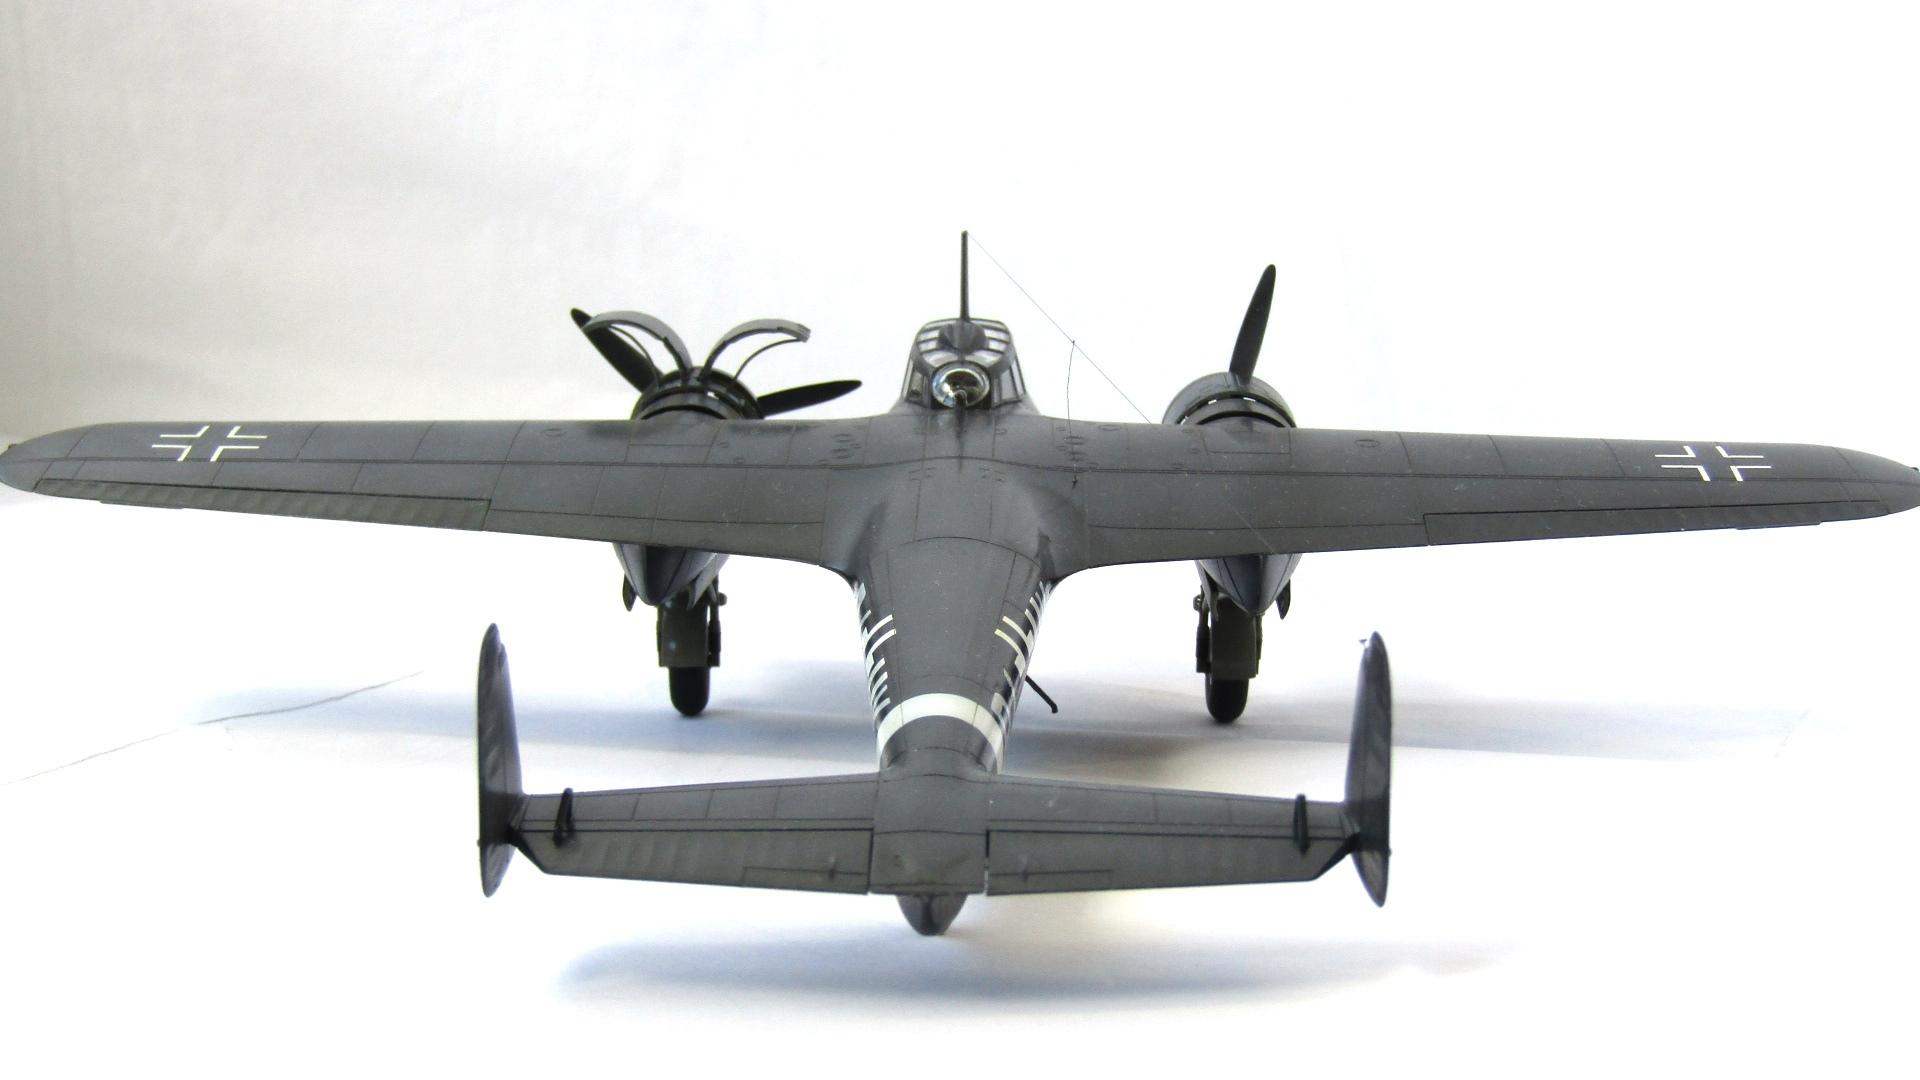 Do-17 Z-7 1/72 (ICM) DtNOJtDw2n4